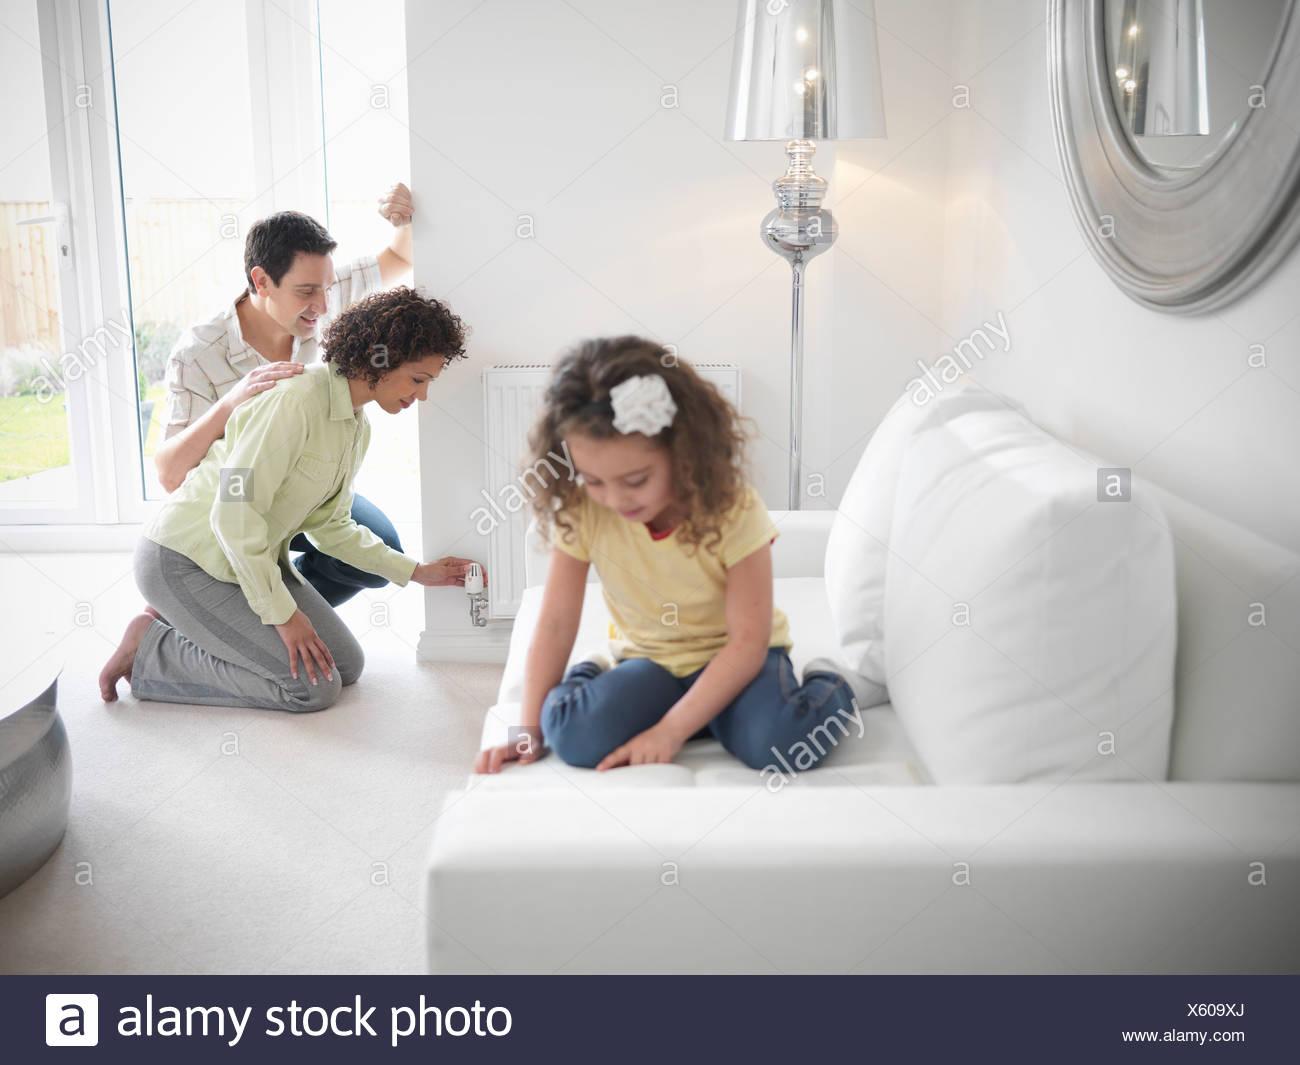 Couple adjusting radiator in living room - Stock Image